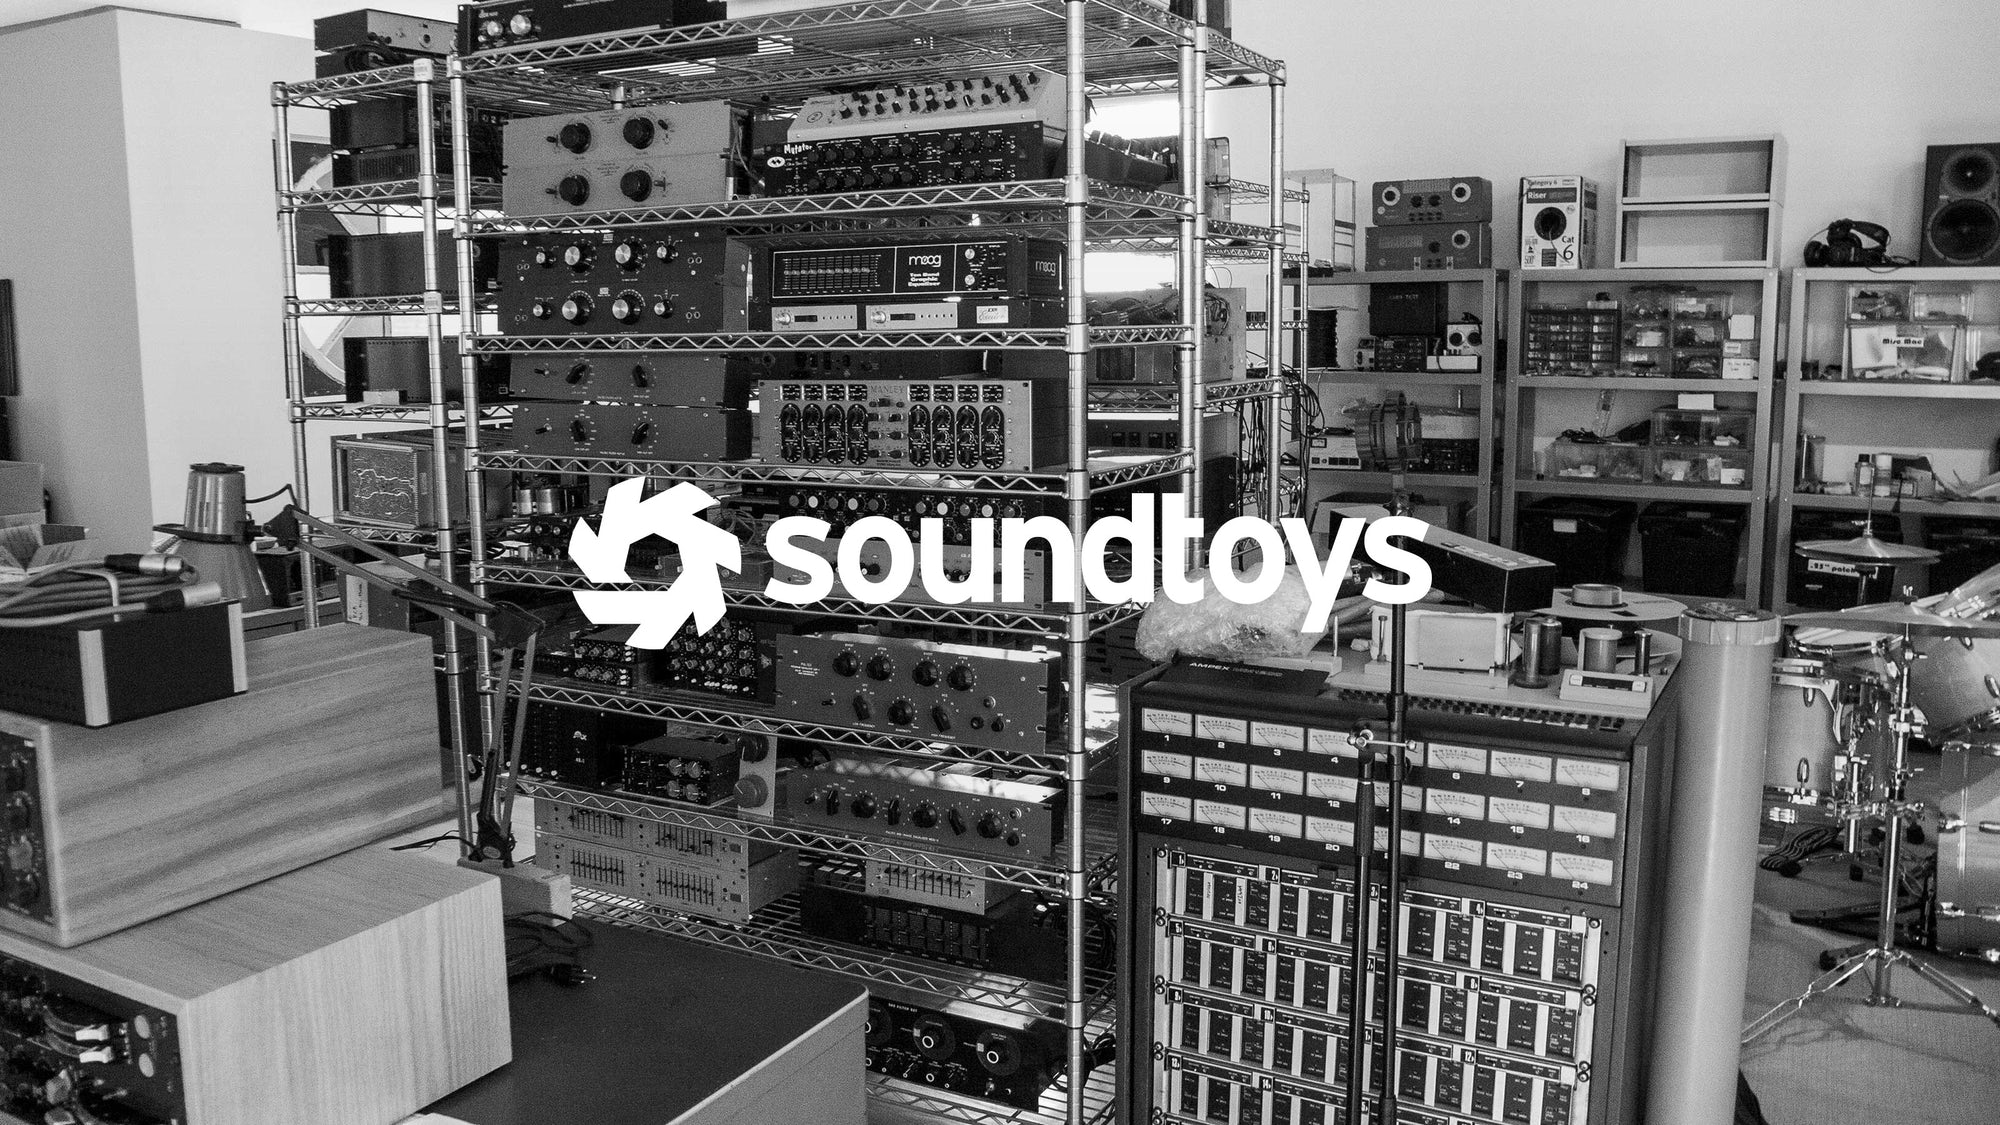 Soundtoys – Brand Identity Design for Music App Company